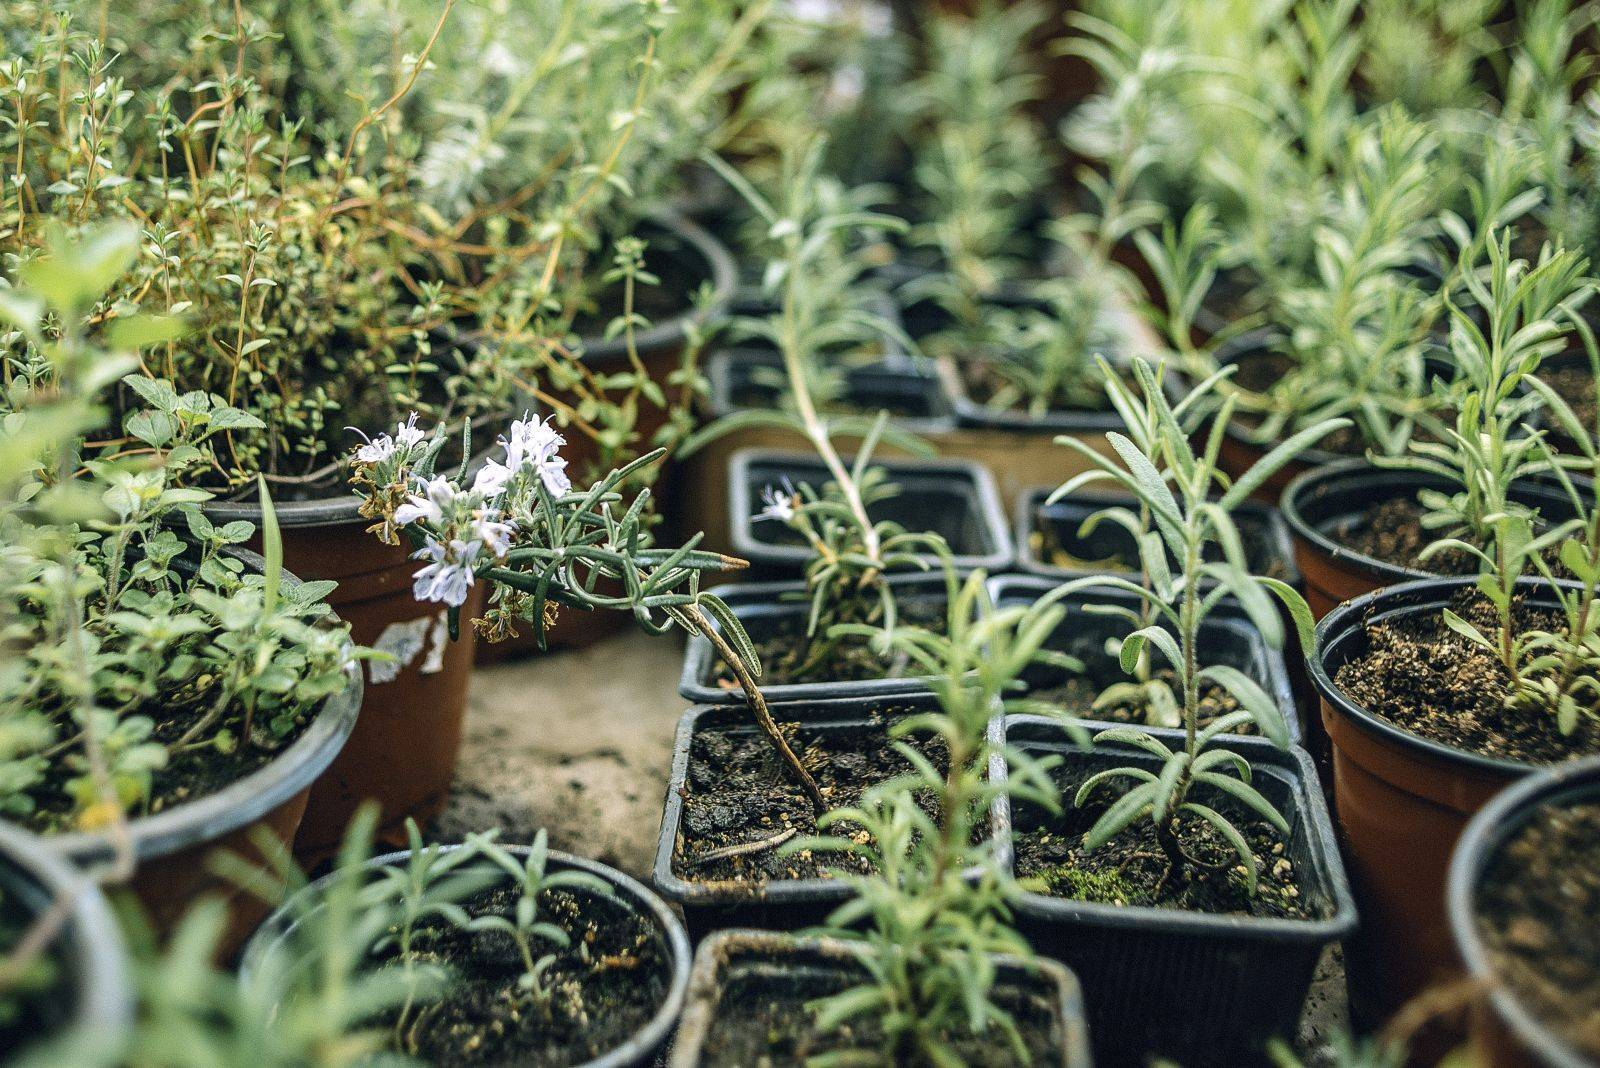 Выращивание розмарина в саду - правила посадки и ухода, видео